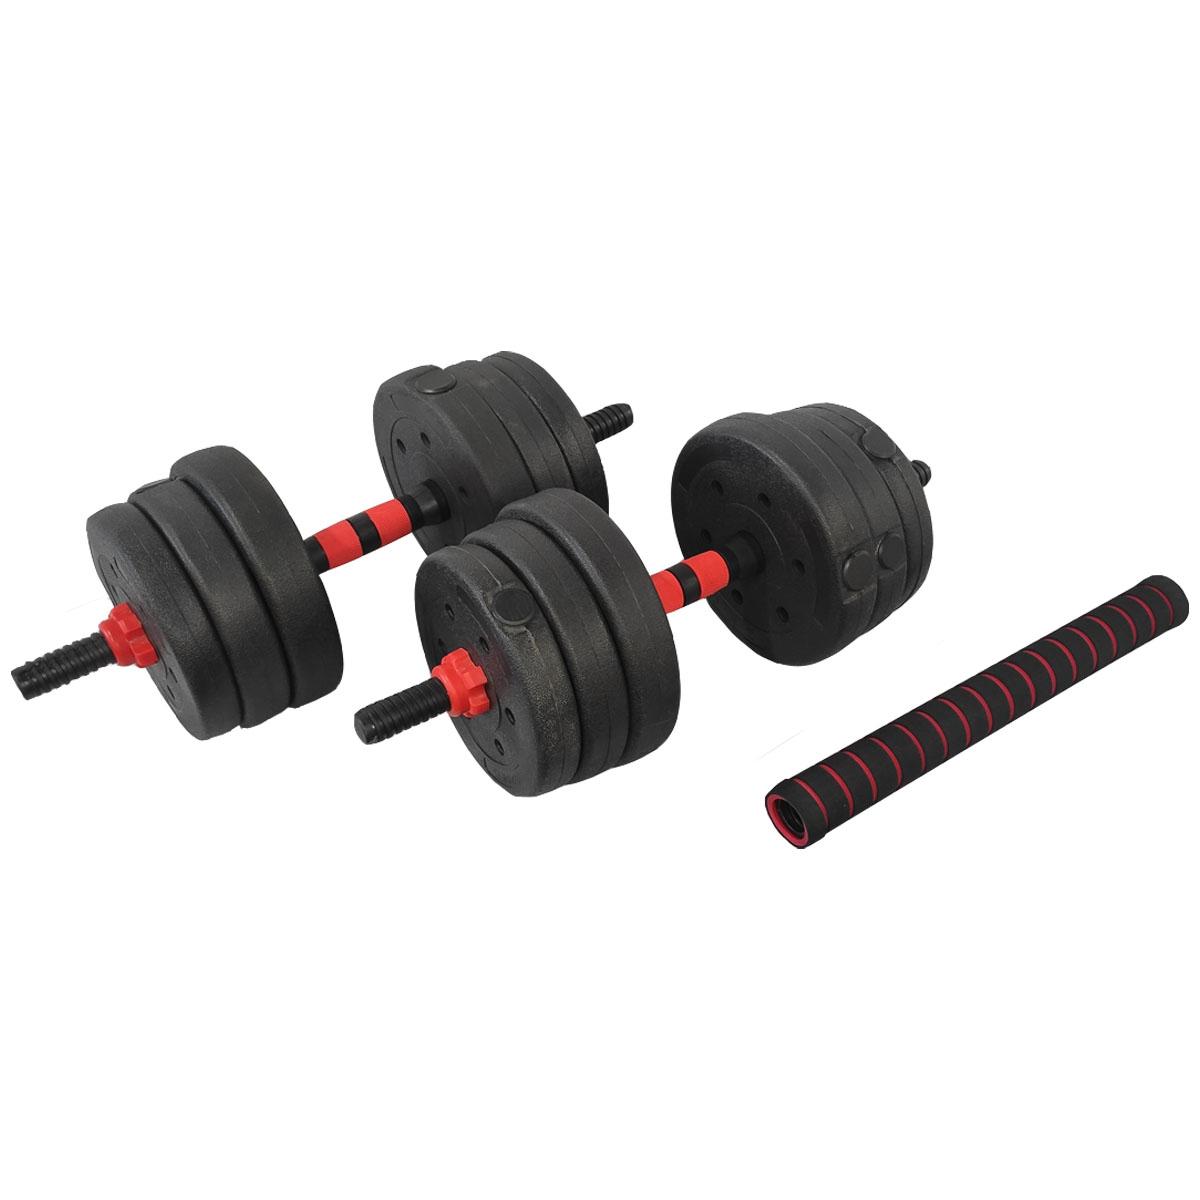 Barra Anilha Halter Dumbbell Kit Musculação 20kg